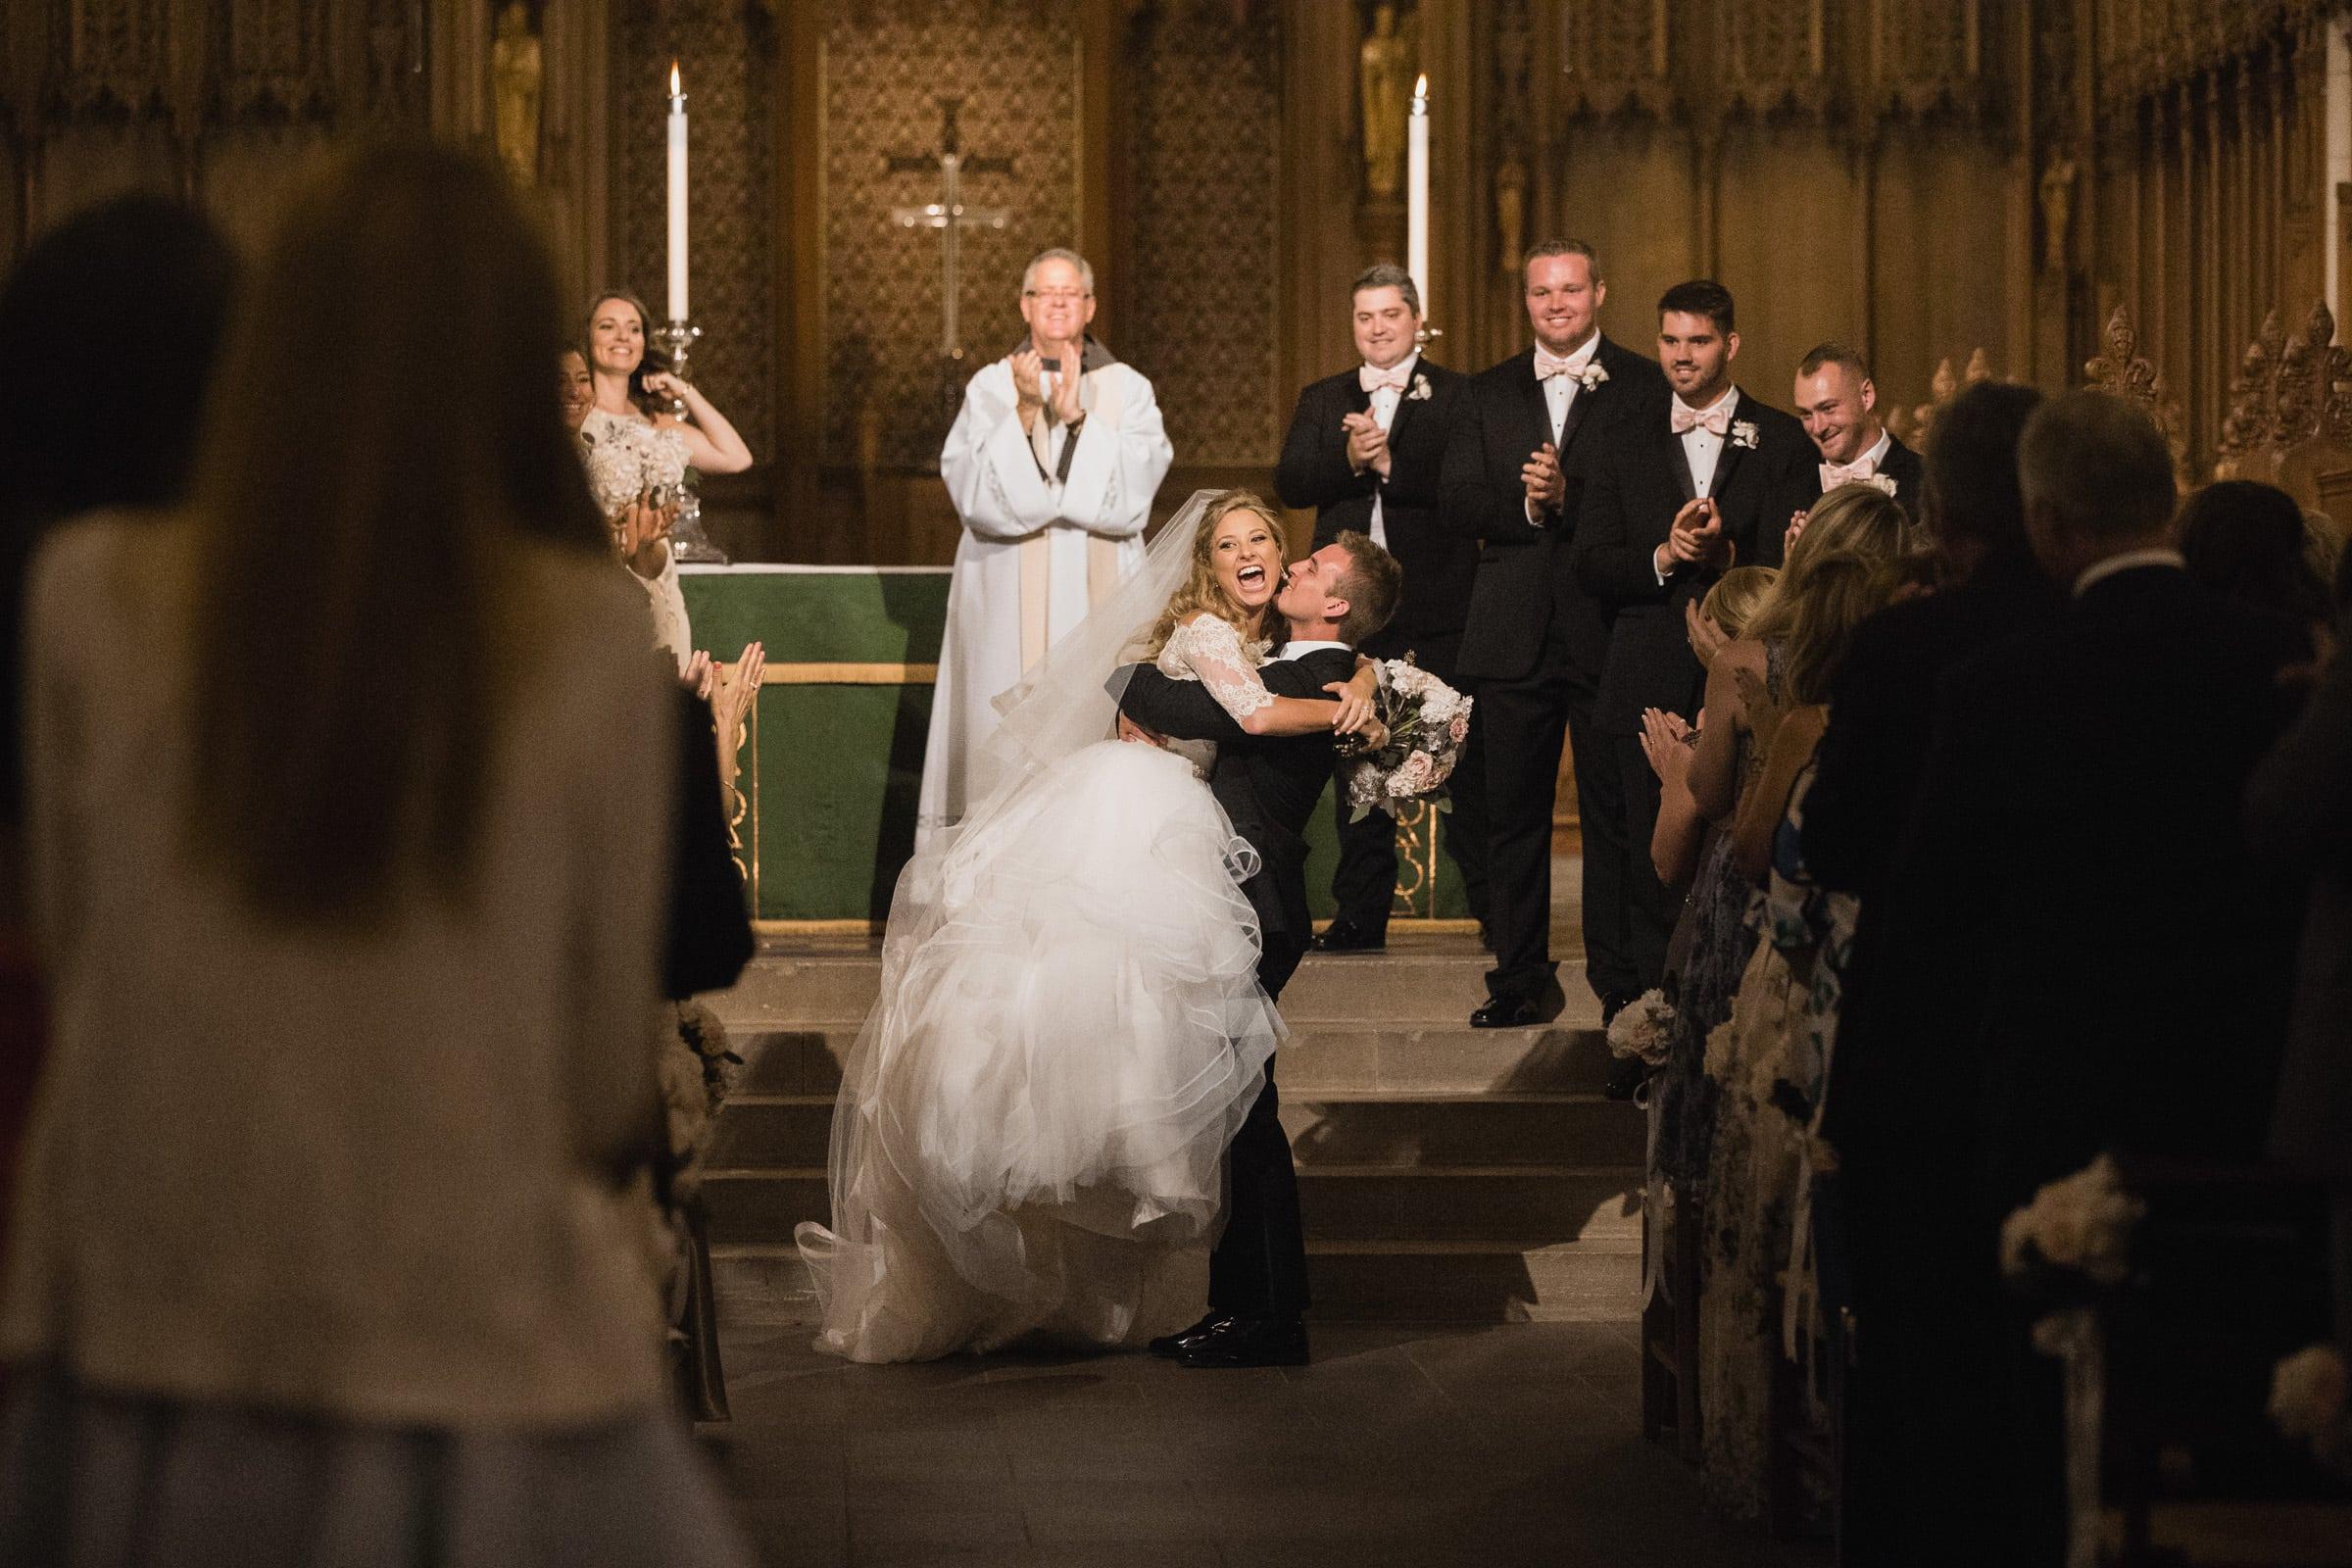 Duke Chapel Wedding Happy Bride & Groom Celebrate